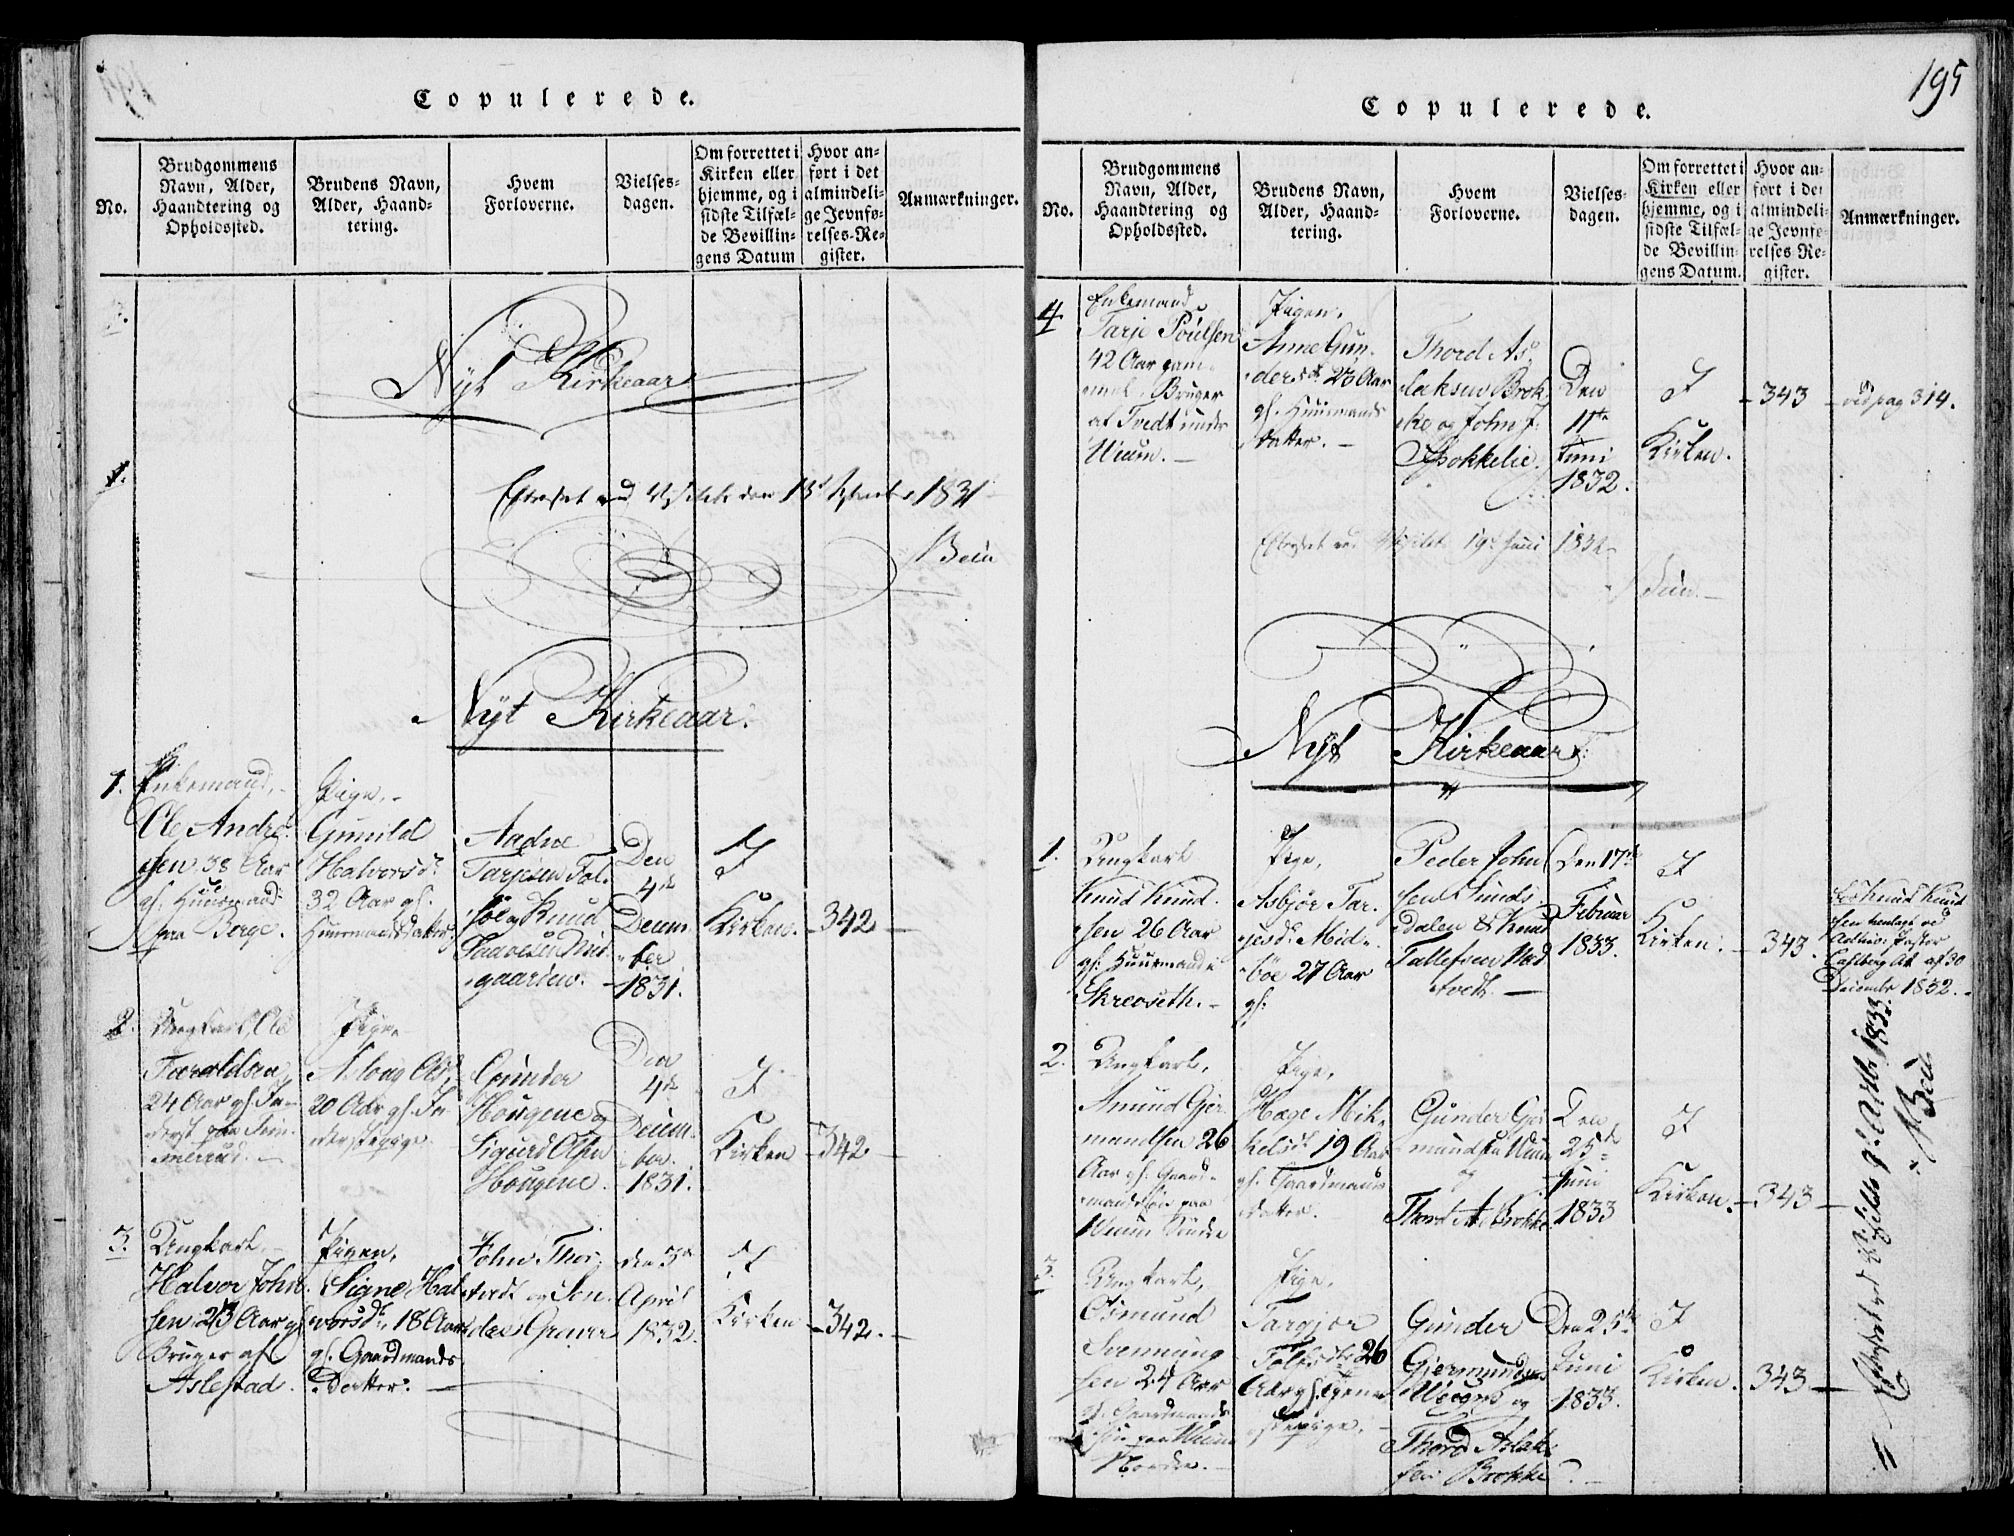 SAKO, Fyresdal kirkebøker, F/Fb/L0001: Ministerialbok nr. II 1, 1815-1854, s. 195